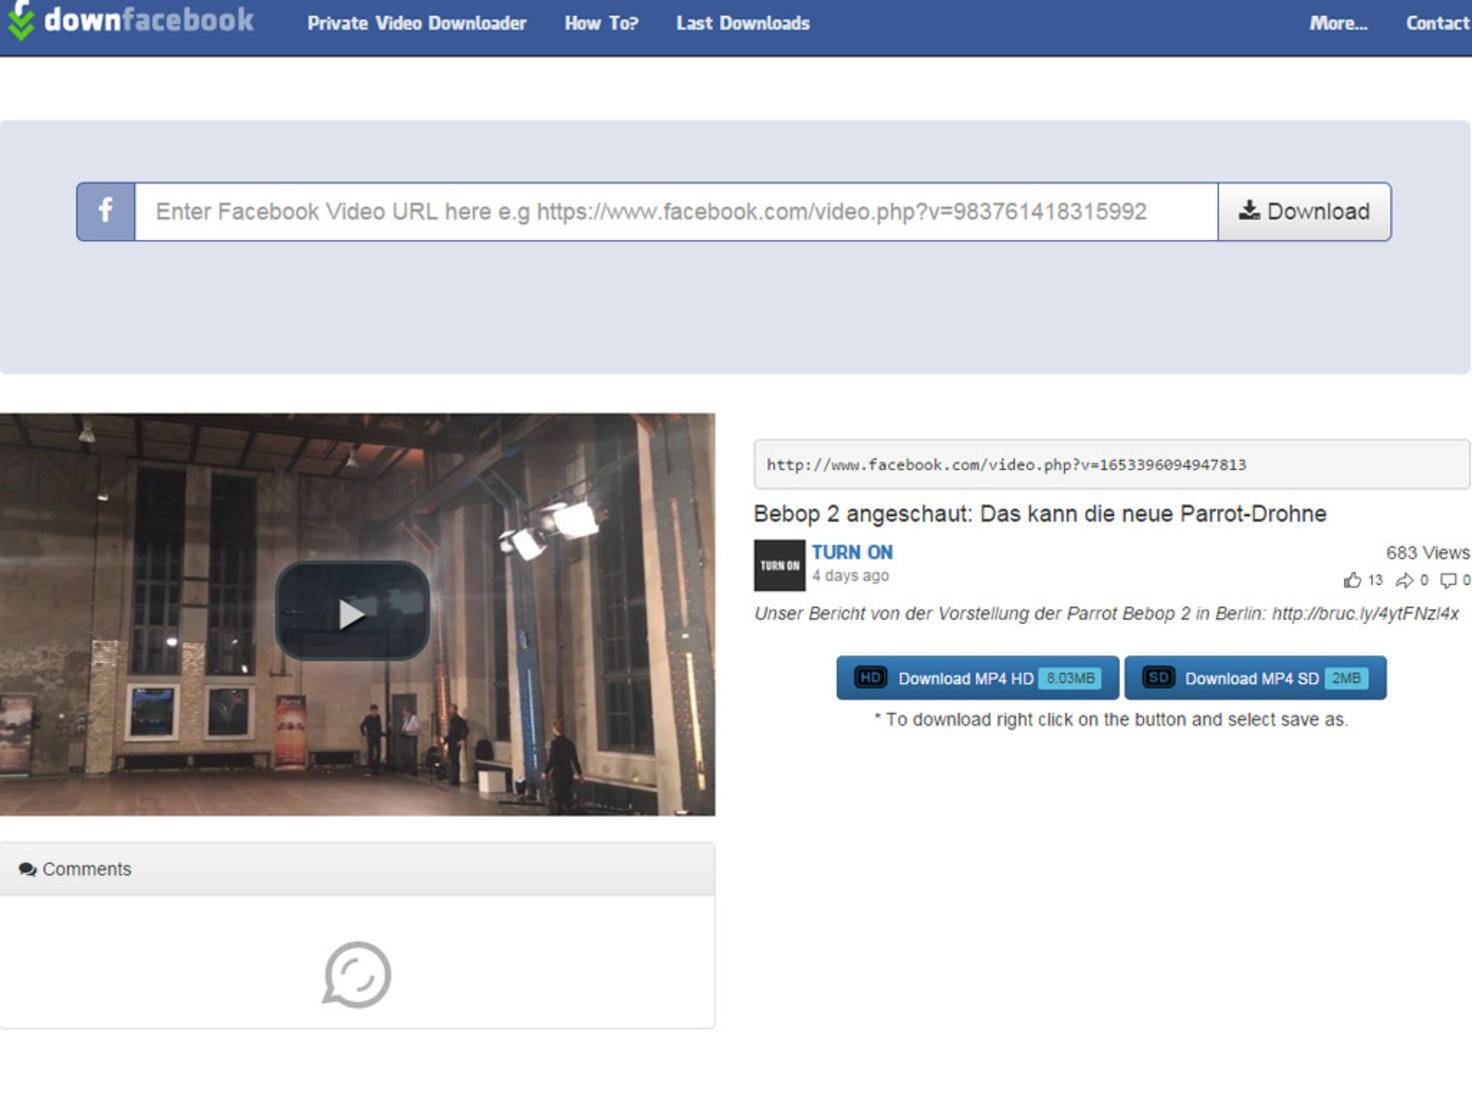 FB-Video-Download-Windows-2